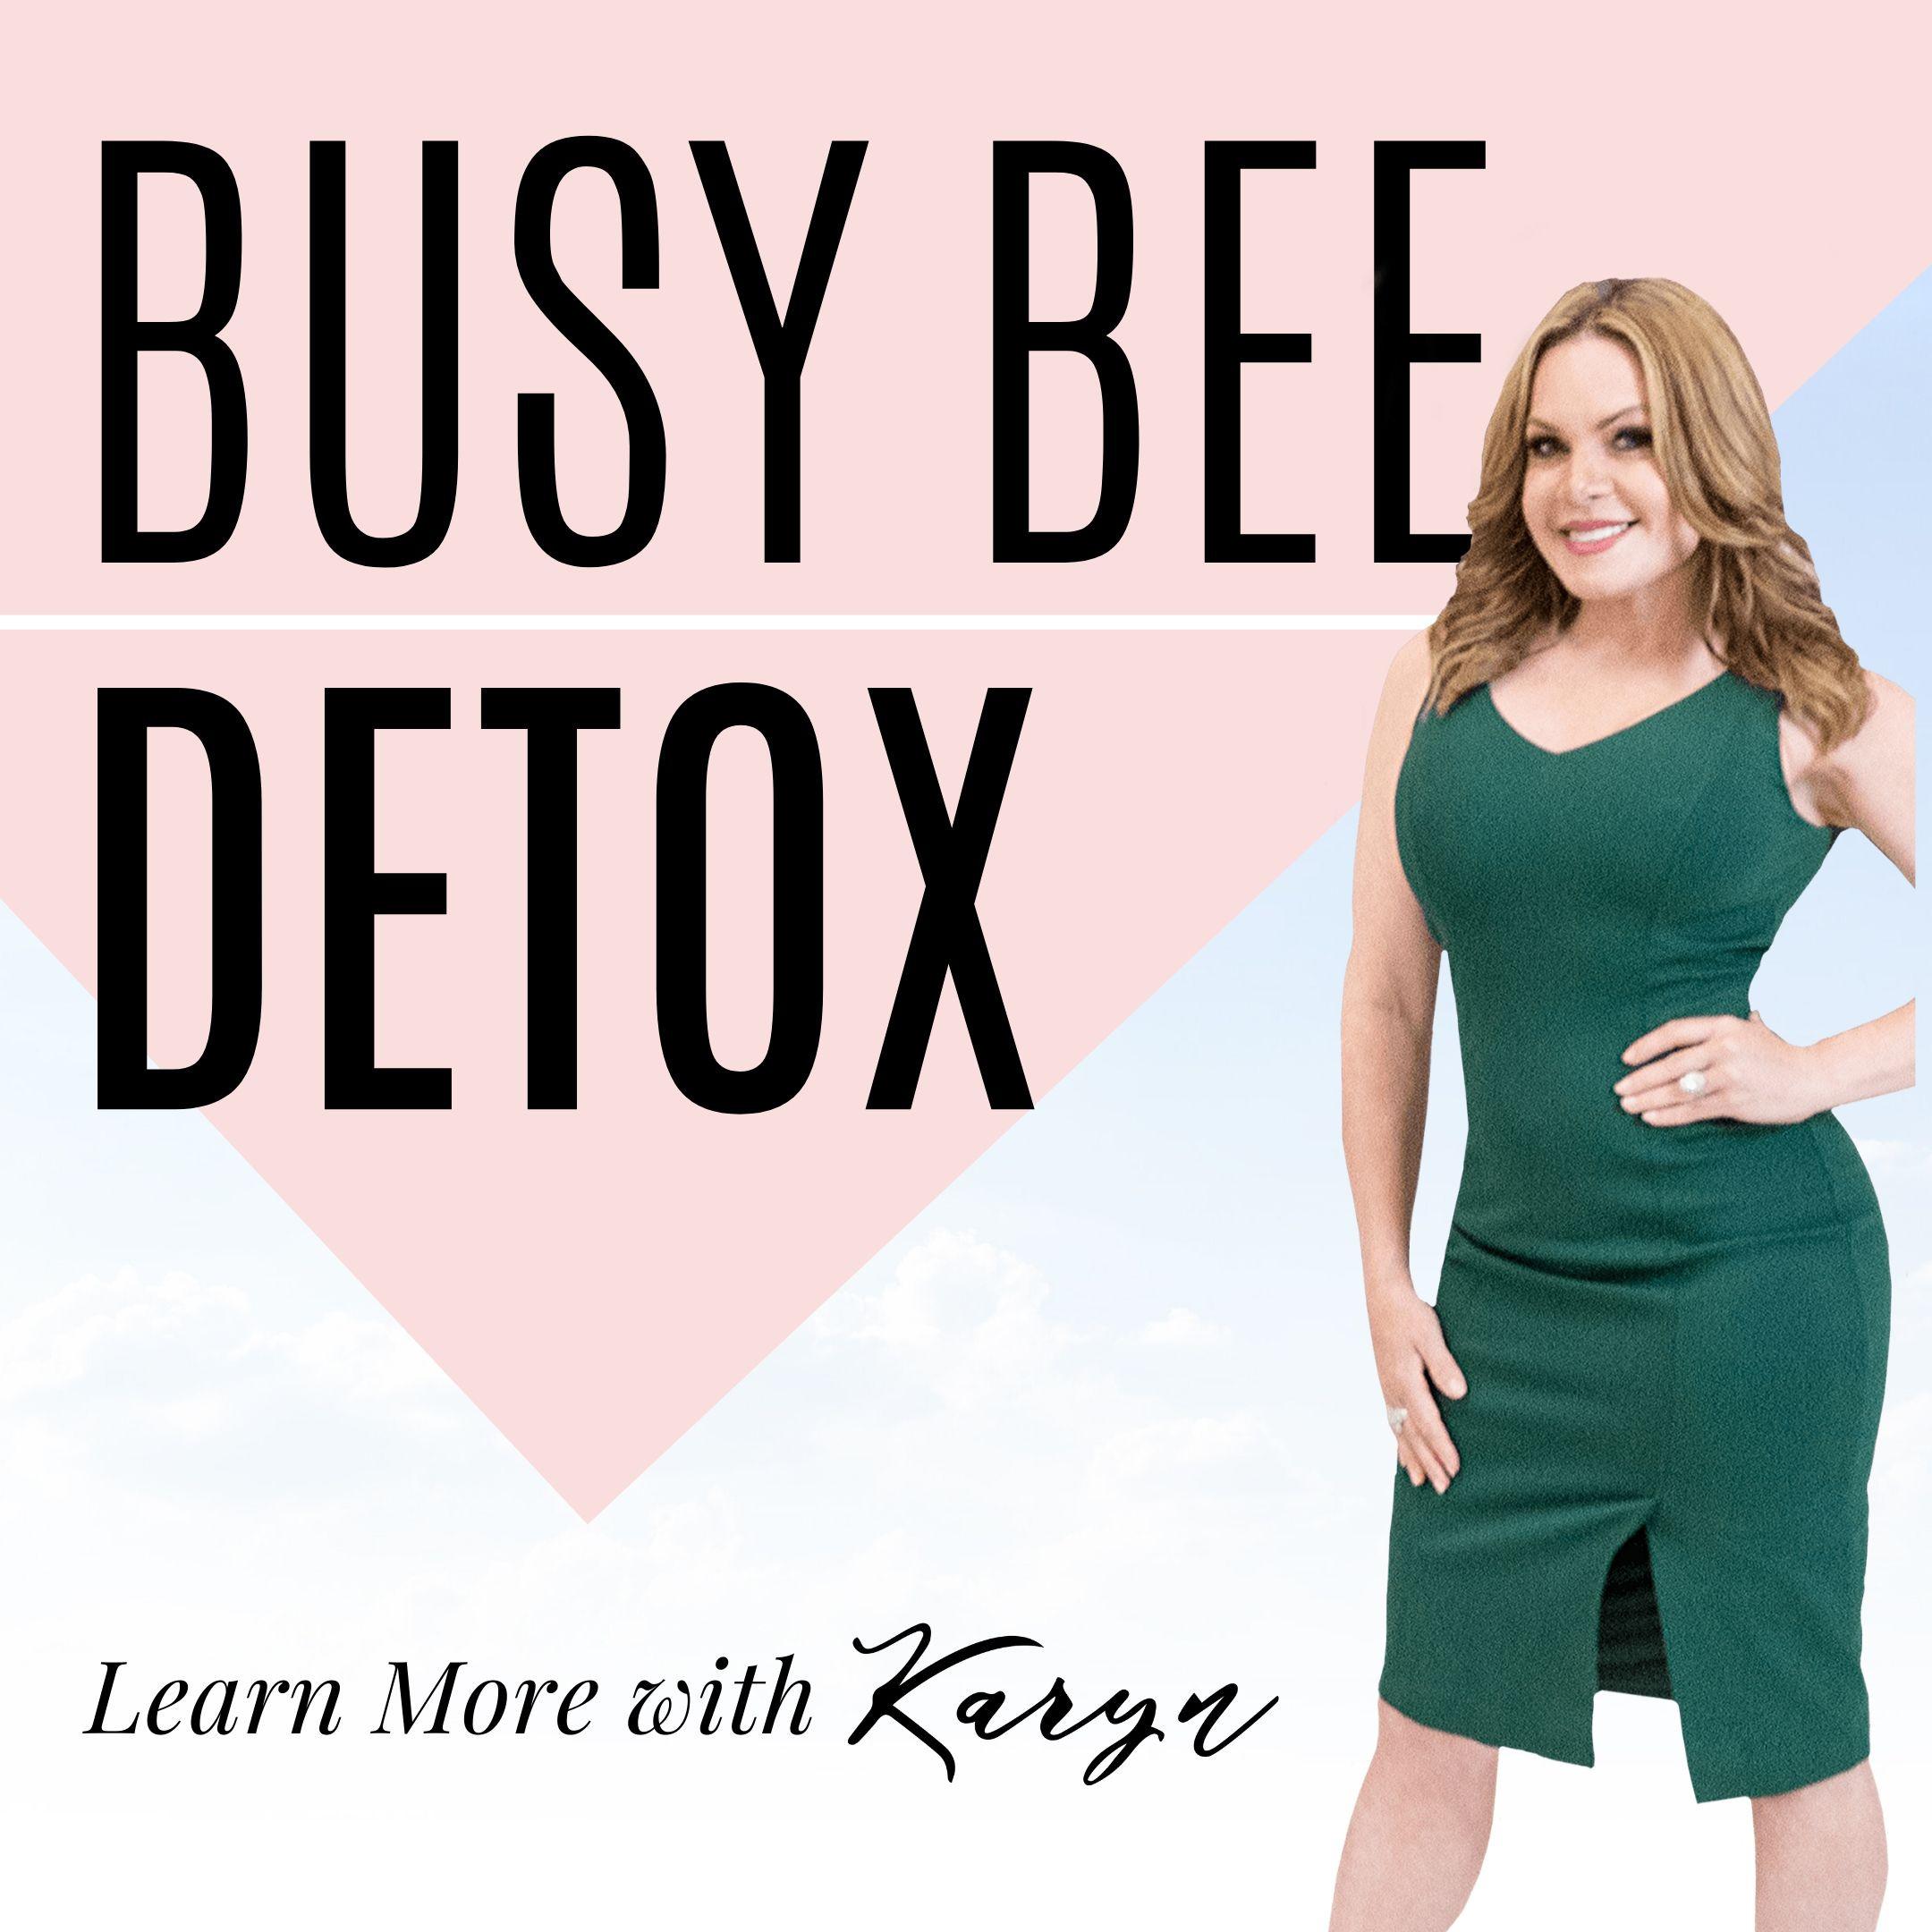 Busy Bee Detox